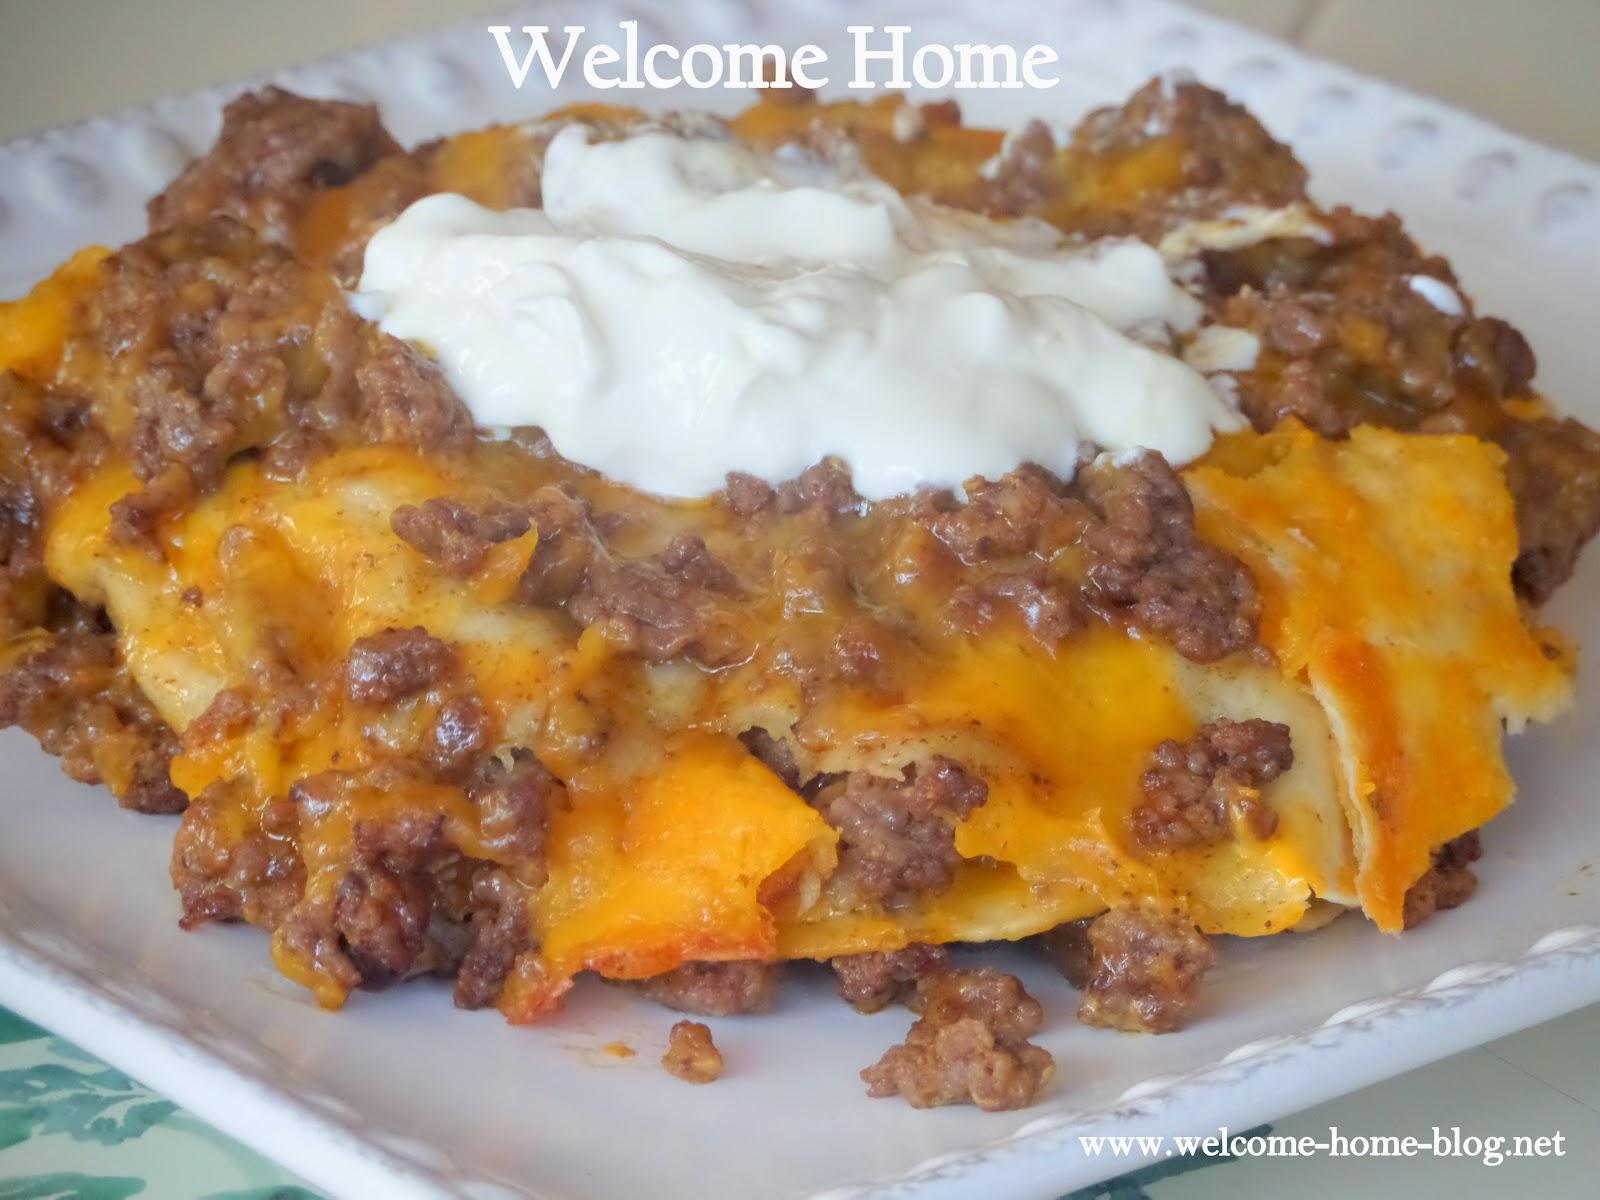 Welcome Home Blog: February 2015